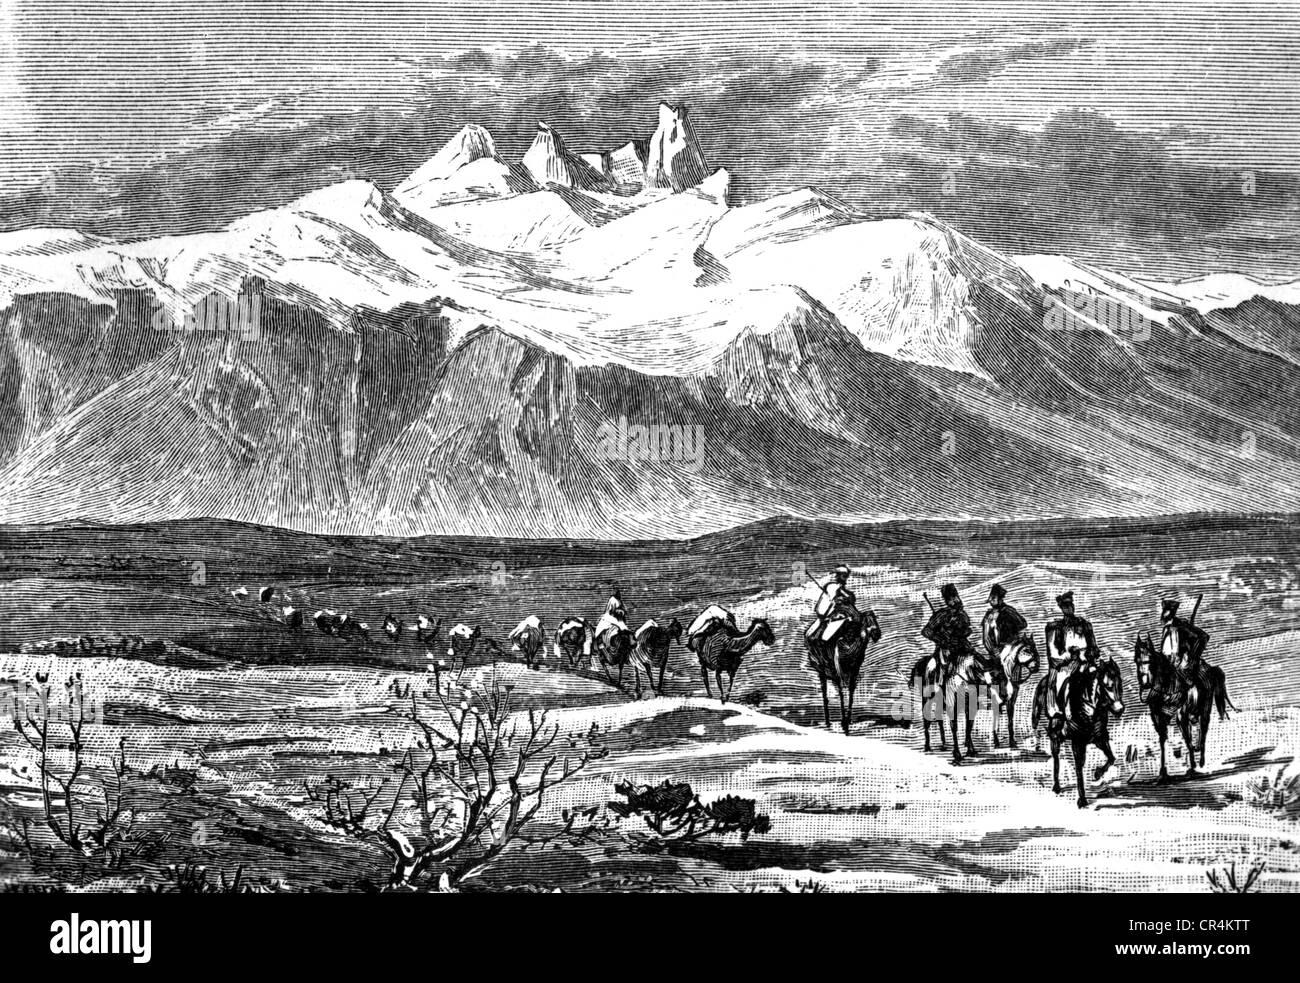 Polo, Marco, 1254 - 8.1.1324, venezianischer Kaufmann, Reisender, auf der Seidenstraße, Ciandu, Holzschnitt, Stockbild